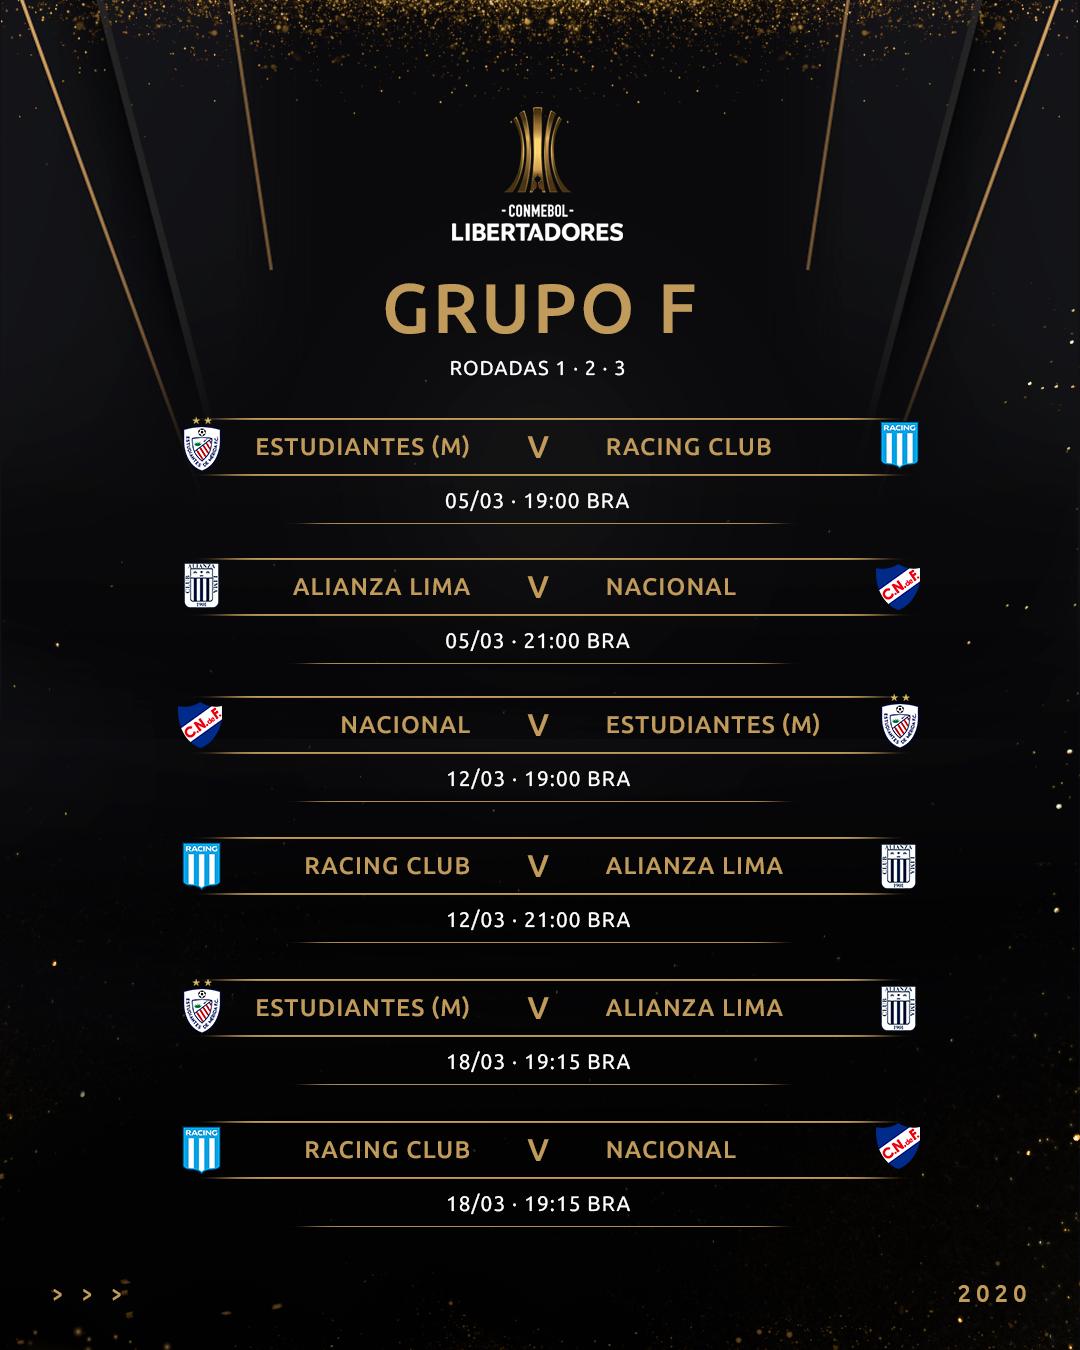 Grupo F - tabela 1 Libertadores